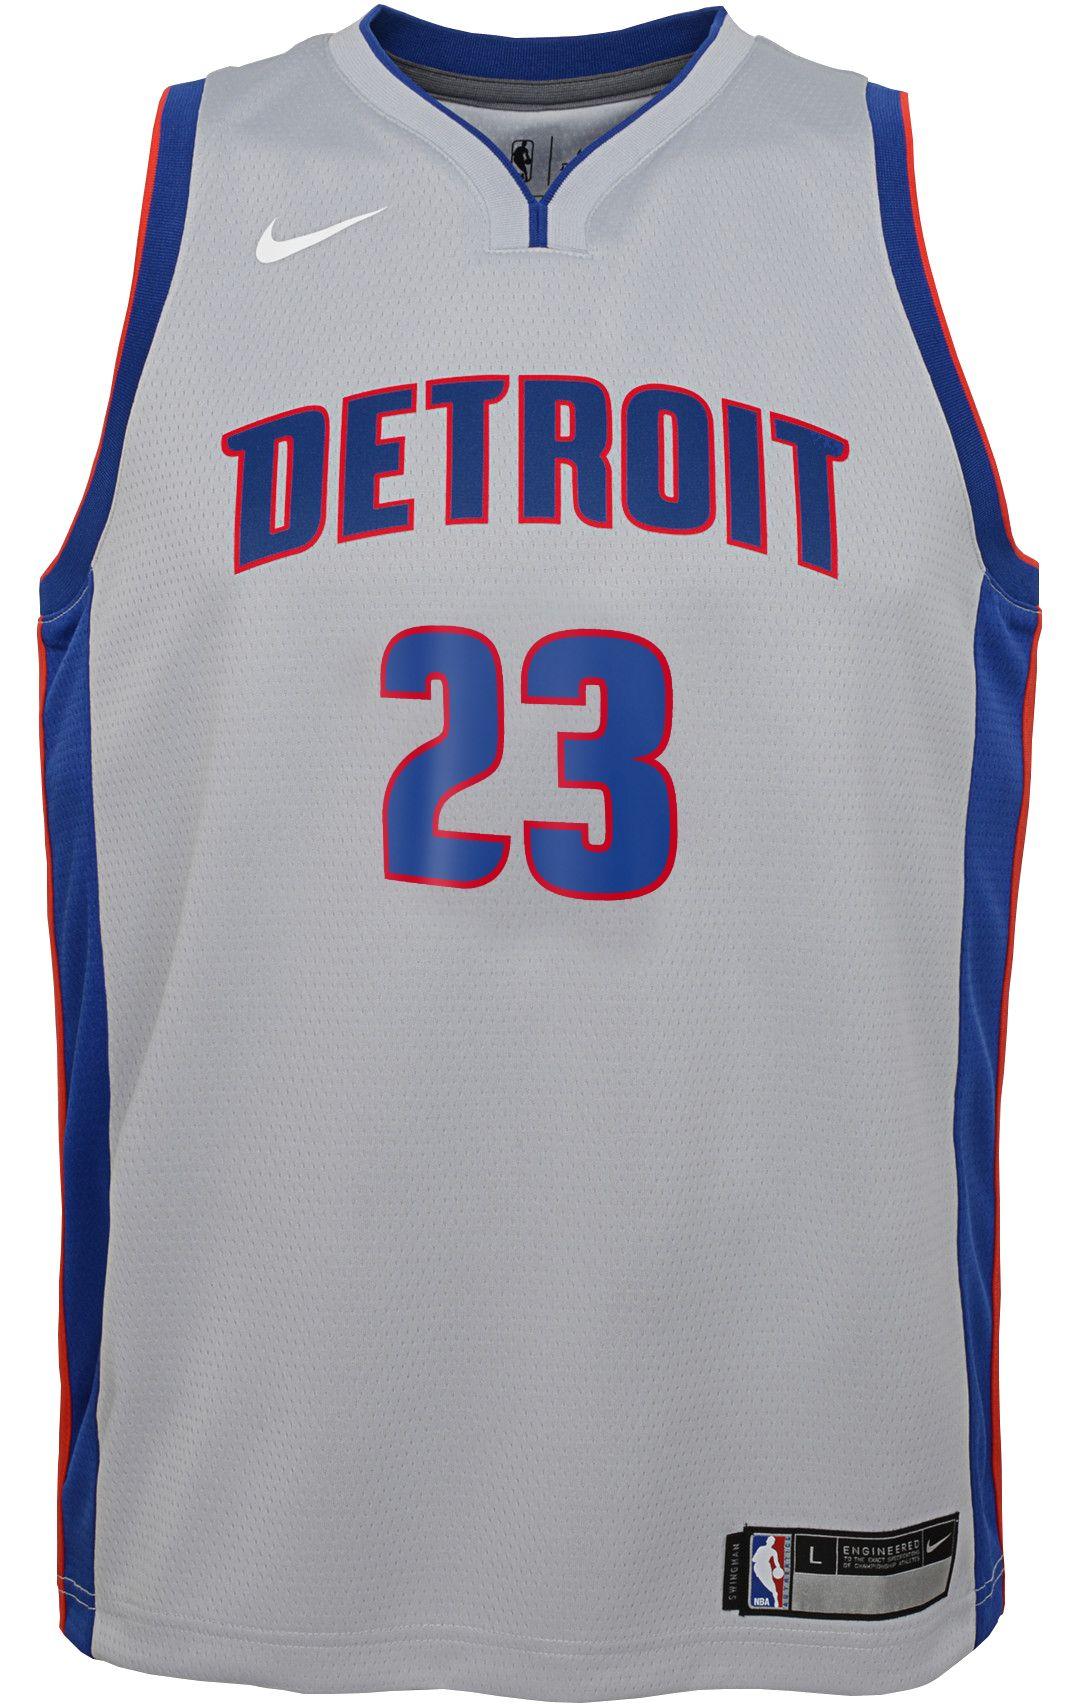 new style 1b8c7 1be19 Nike Youth Detroit Pistons Blake Griffin #23 Grey Dri-FIT Swingman Jersey